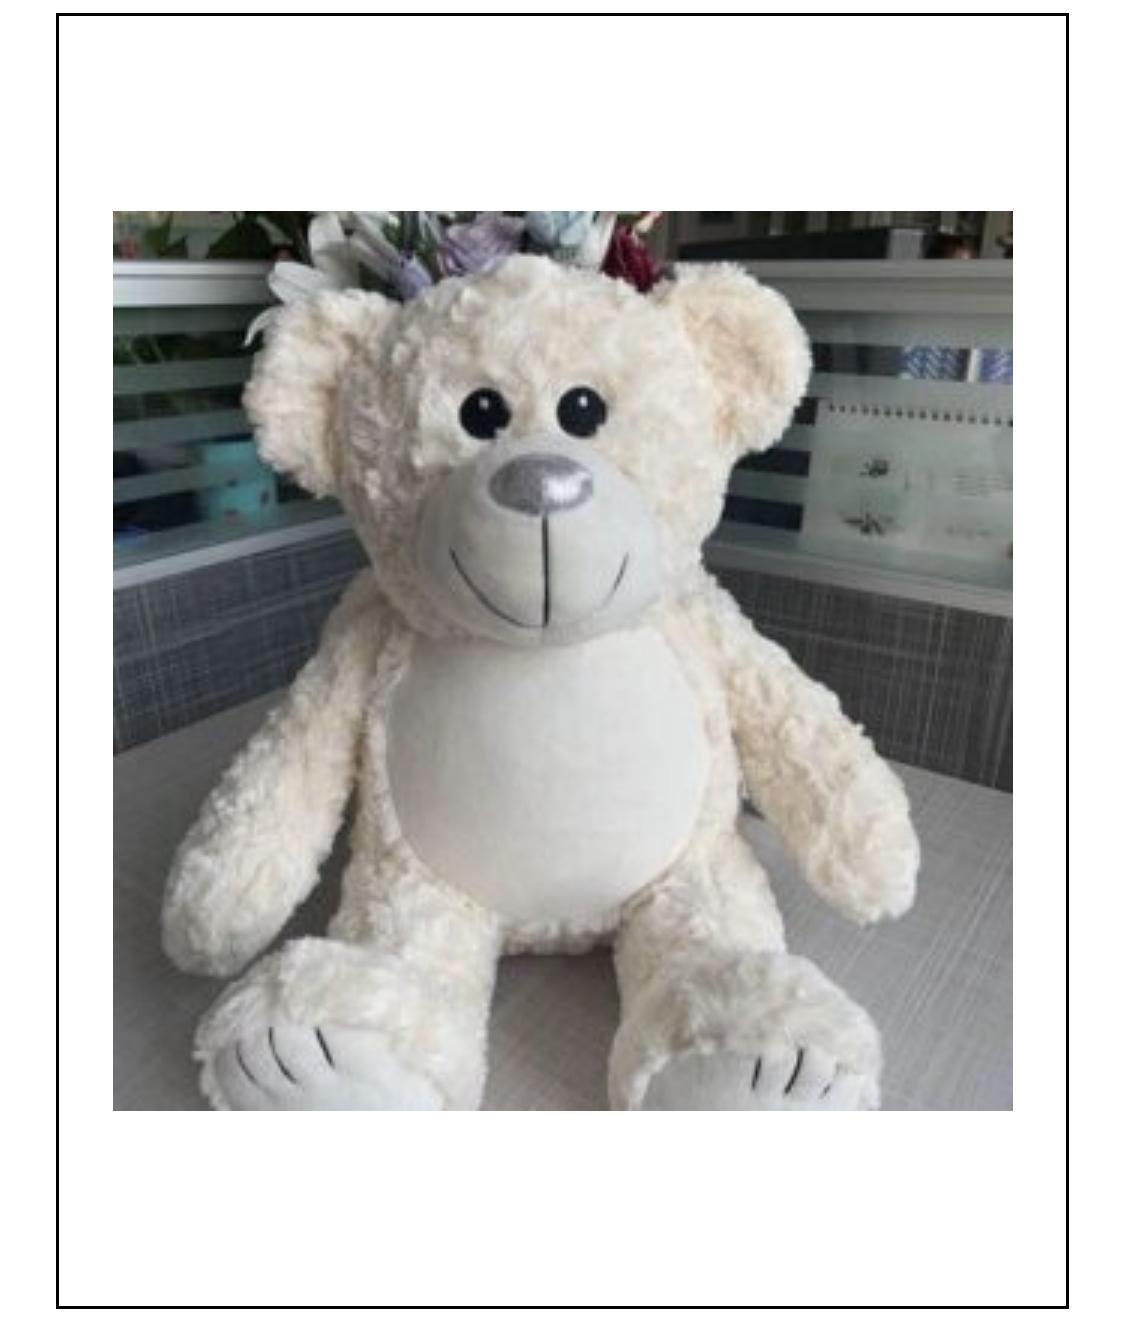 Plush Teddy Bears and Animals